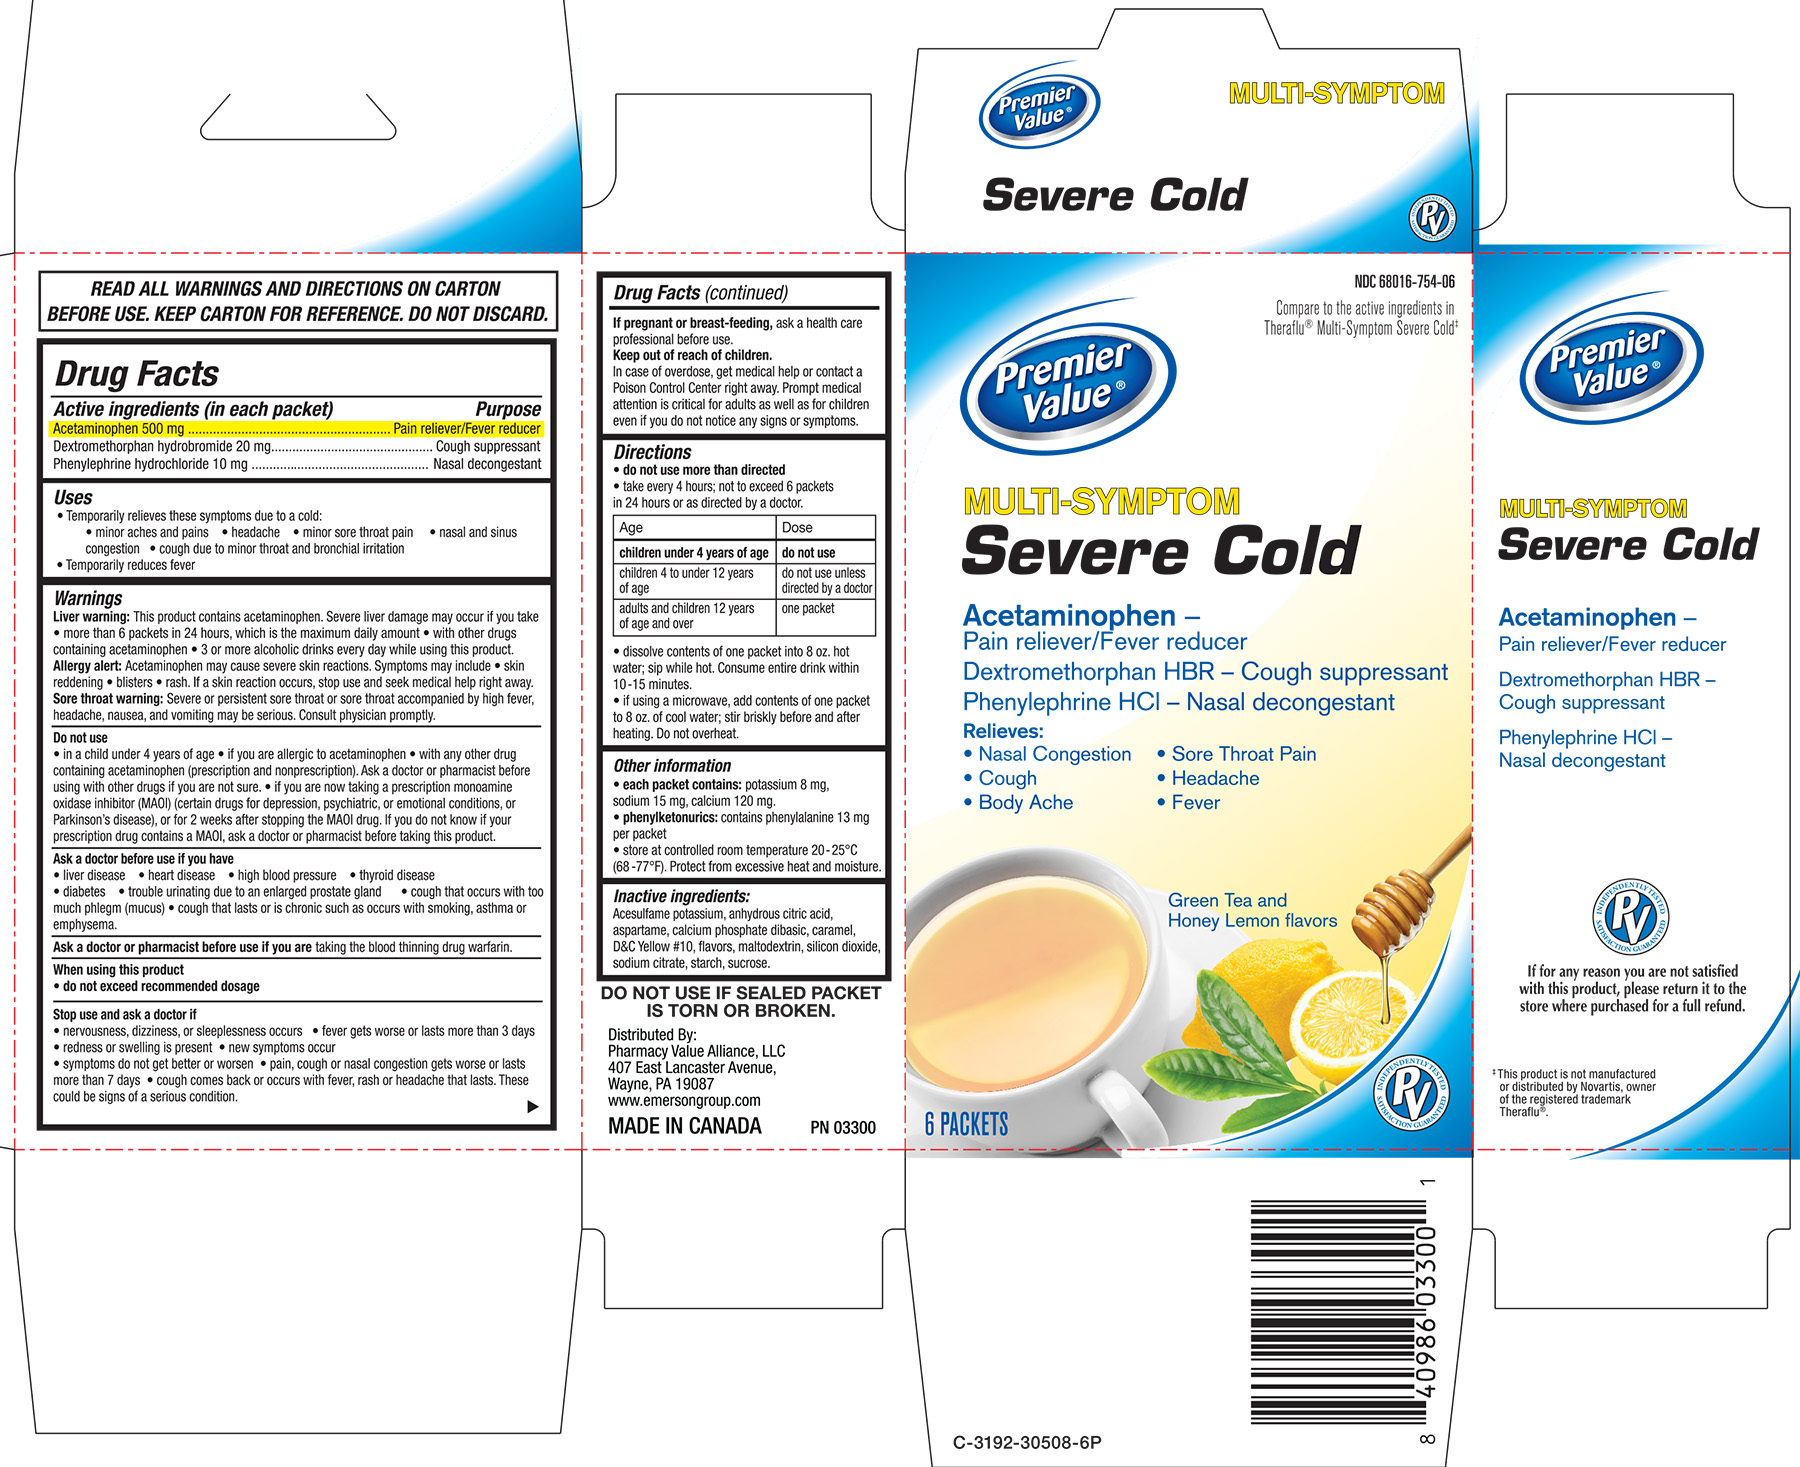 Premier Value Multi-symptom Severe Cold Green Tea And Honey Lemon Flavors Breastfeeding